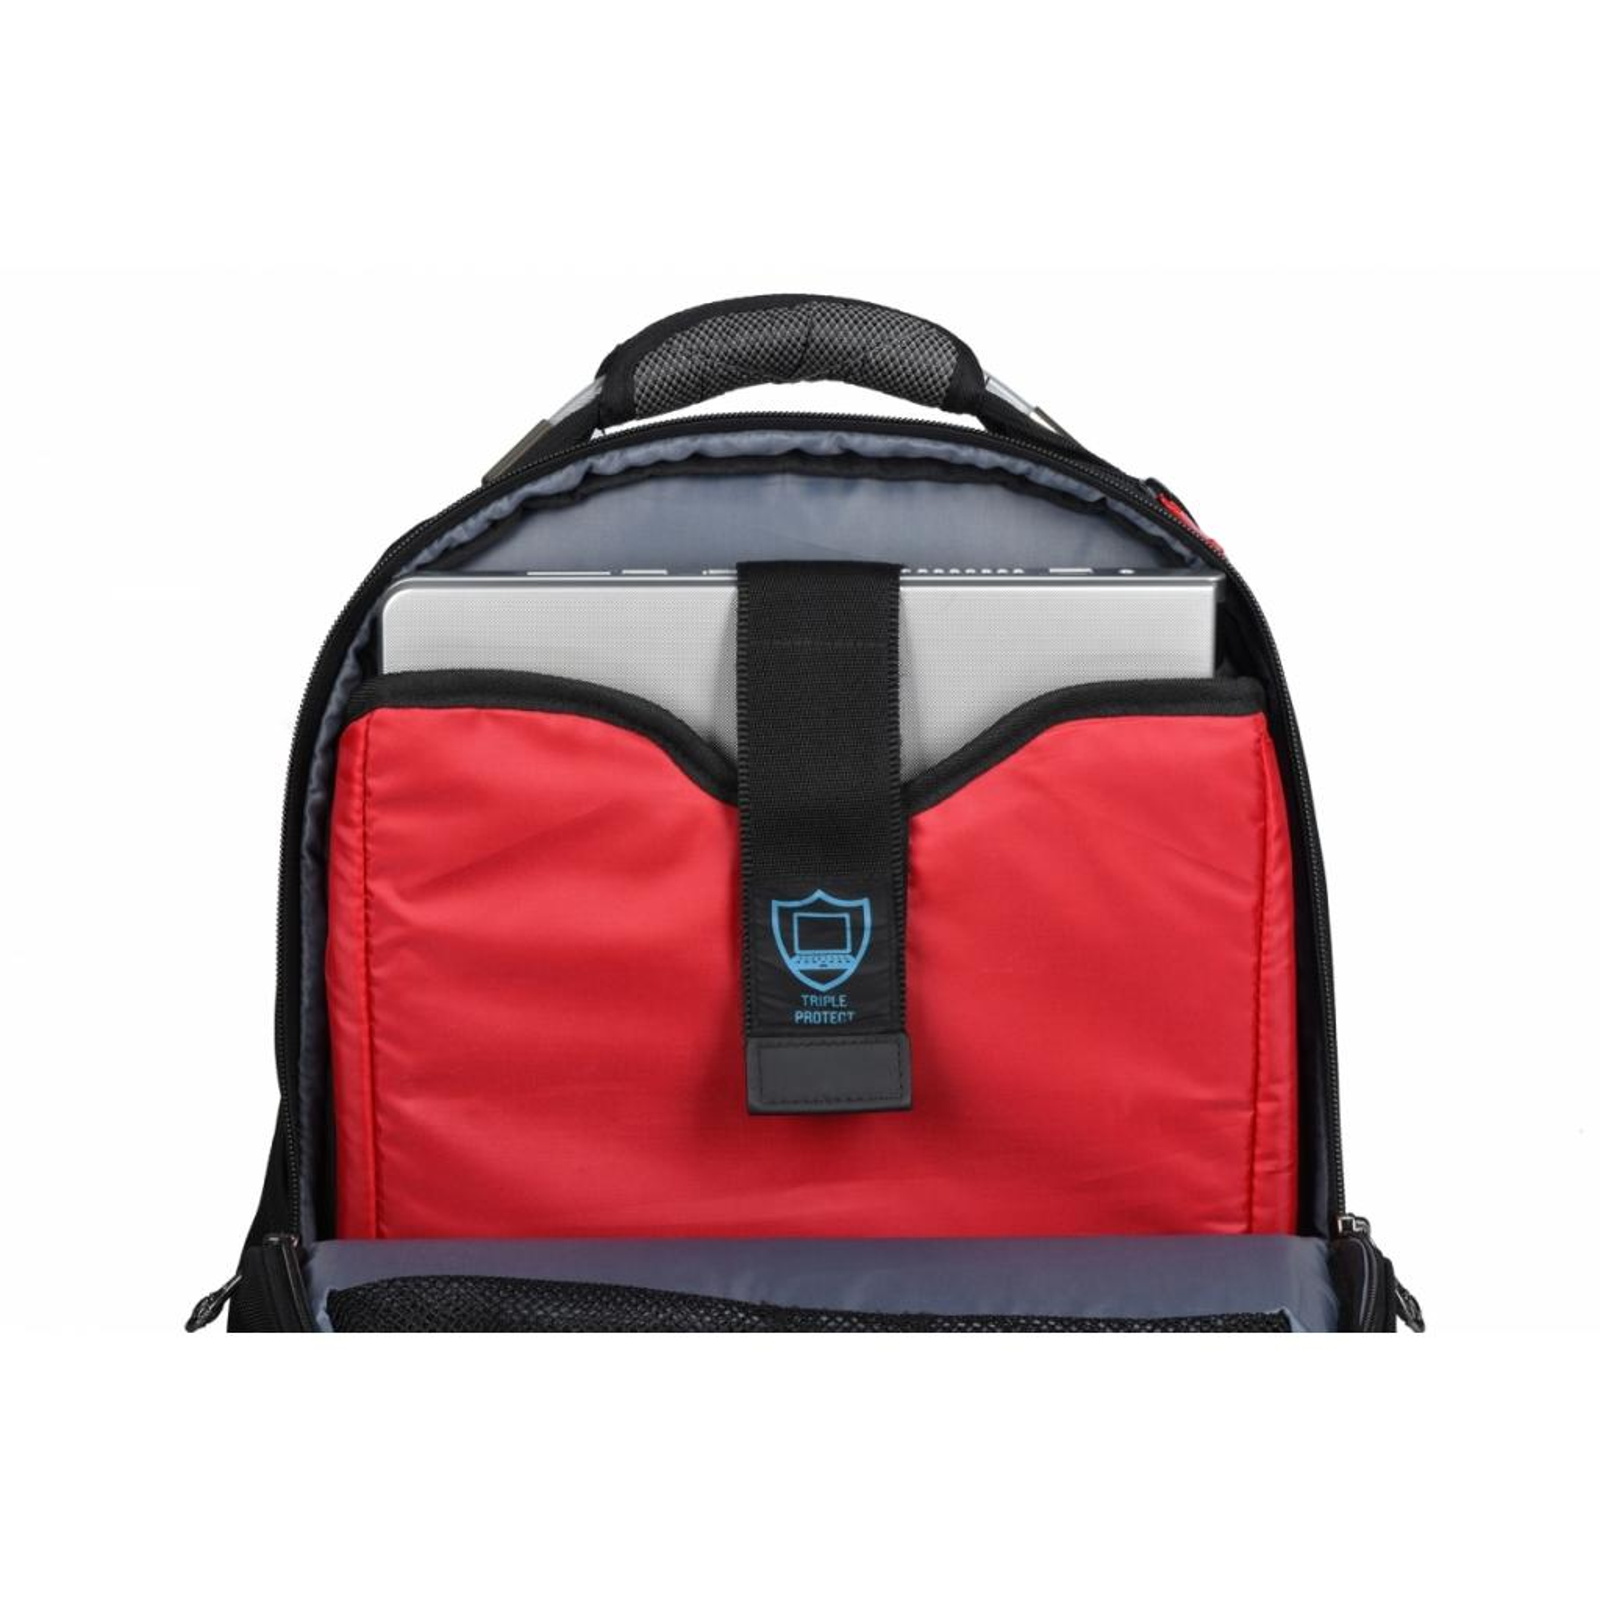 "Рюкзак для ноутбука Wenger 16"" Synergy Black/Gray (600635) изображение 8"